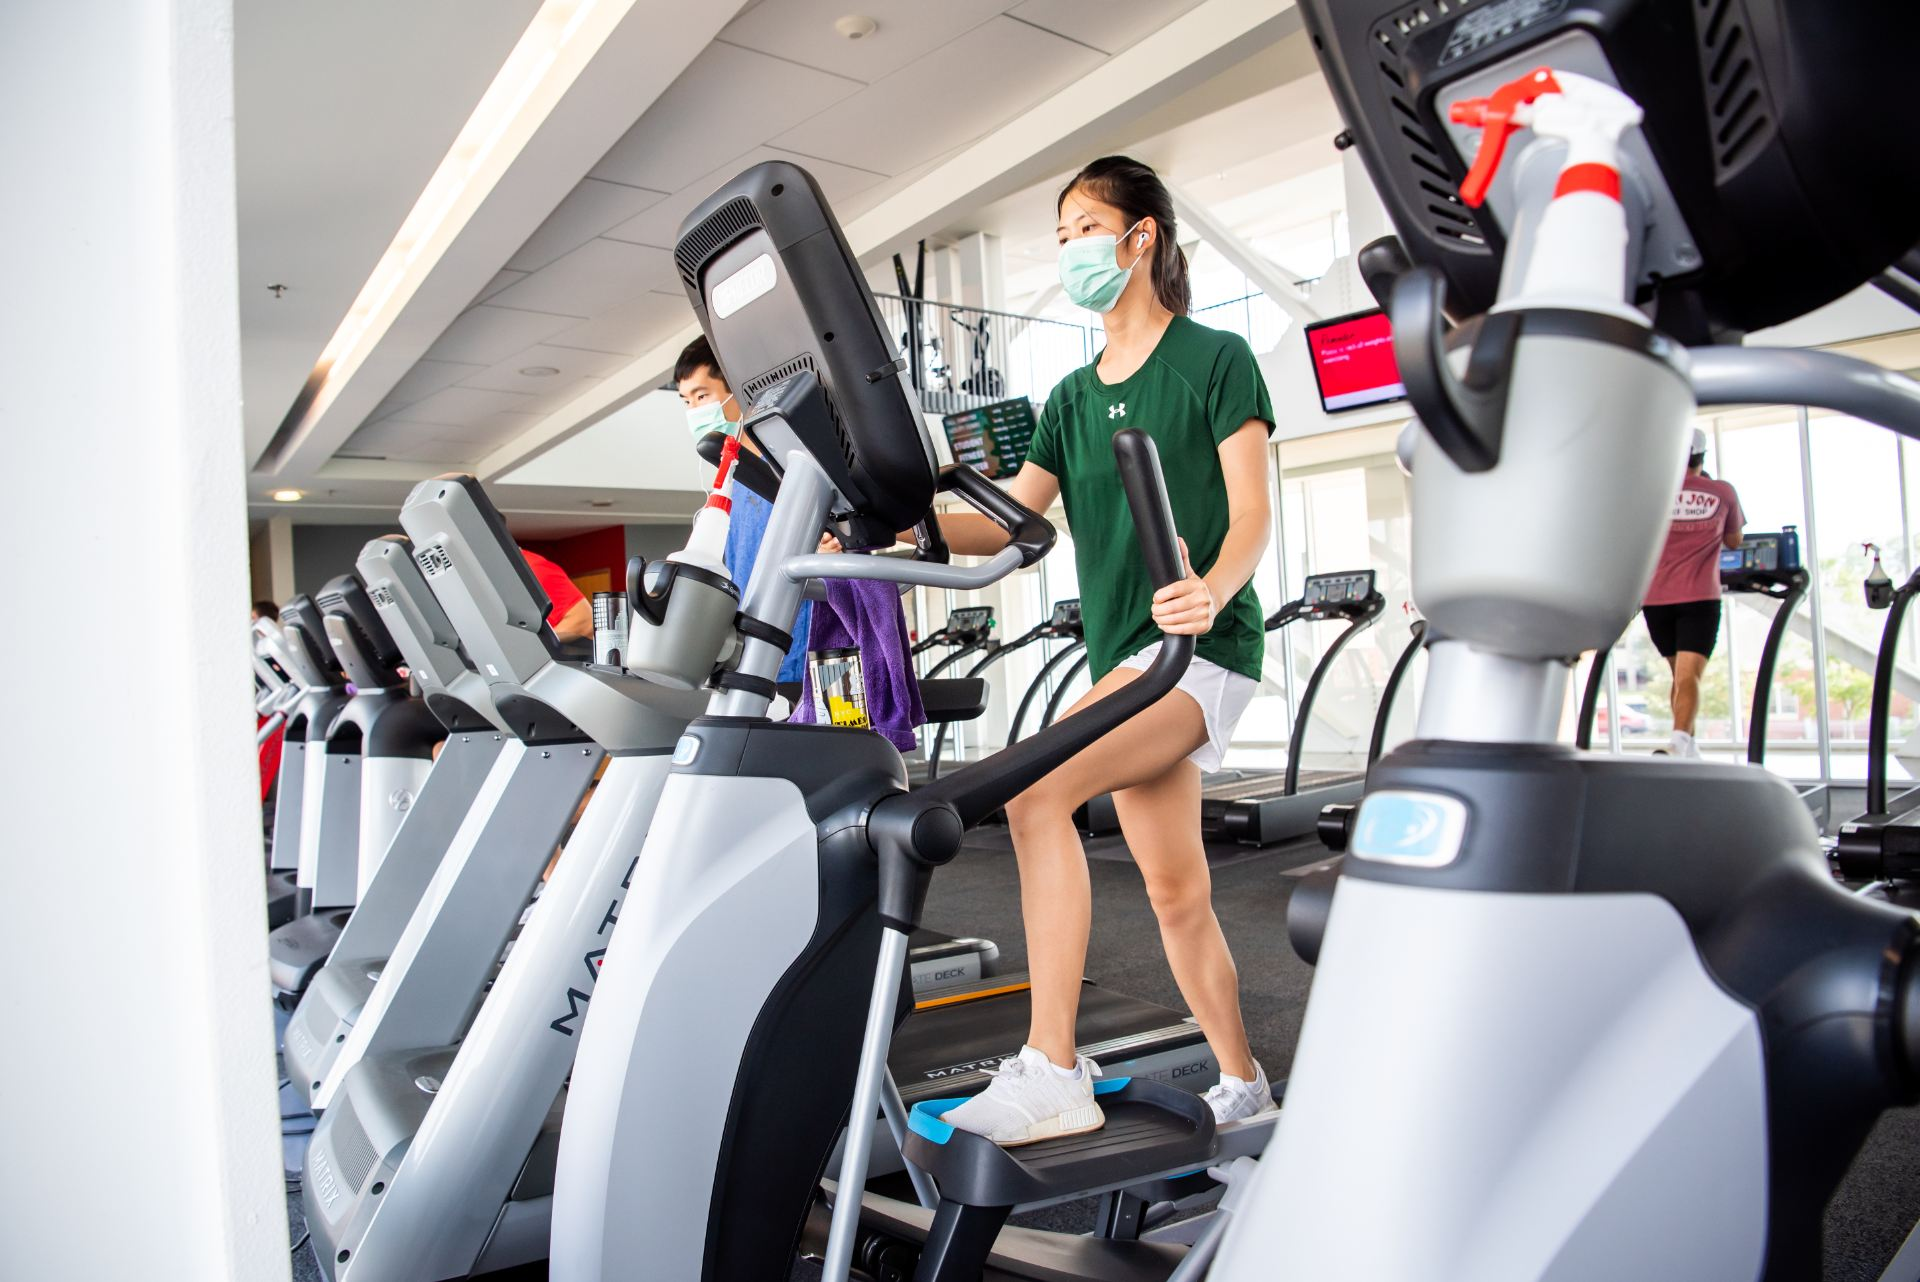 MBA student Pasinee Veerutamasen jogs on a treadmill in the Student Fitness Center.